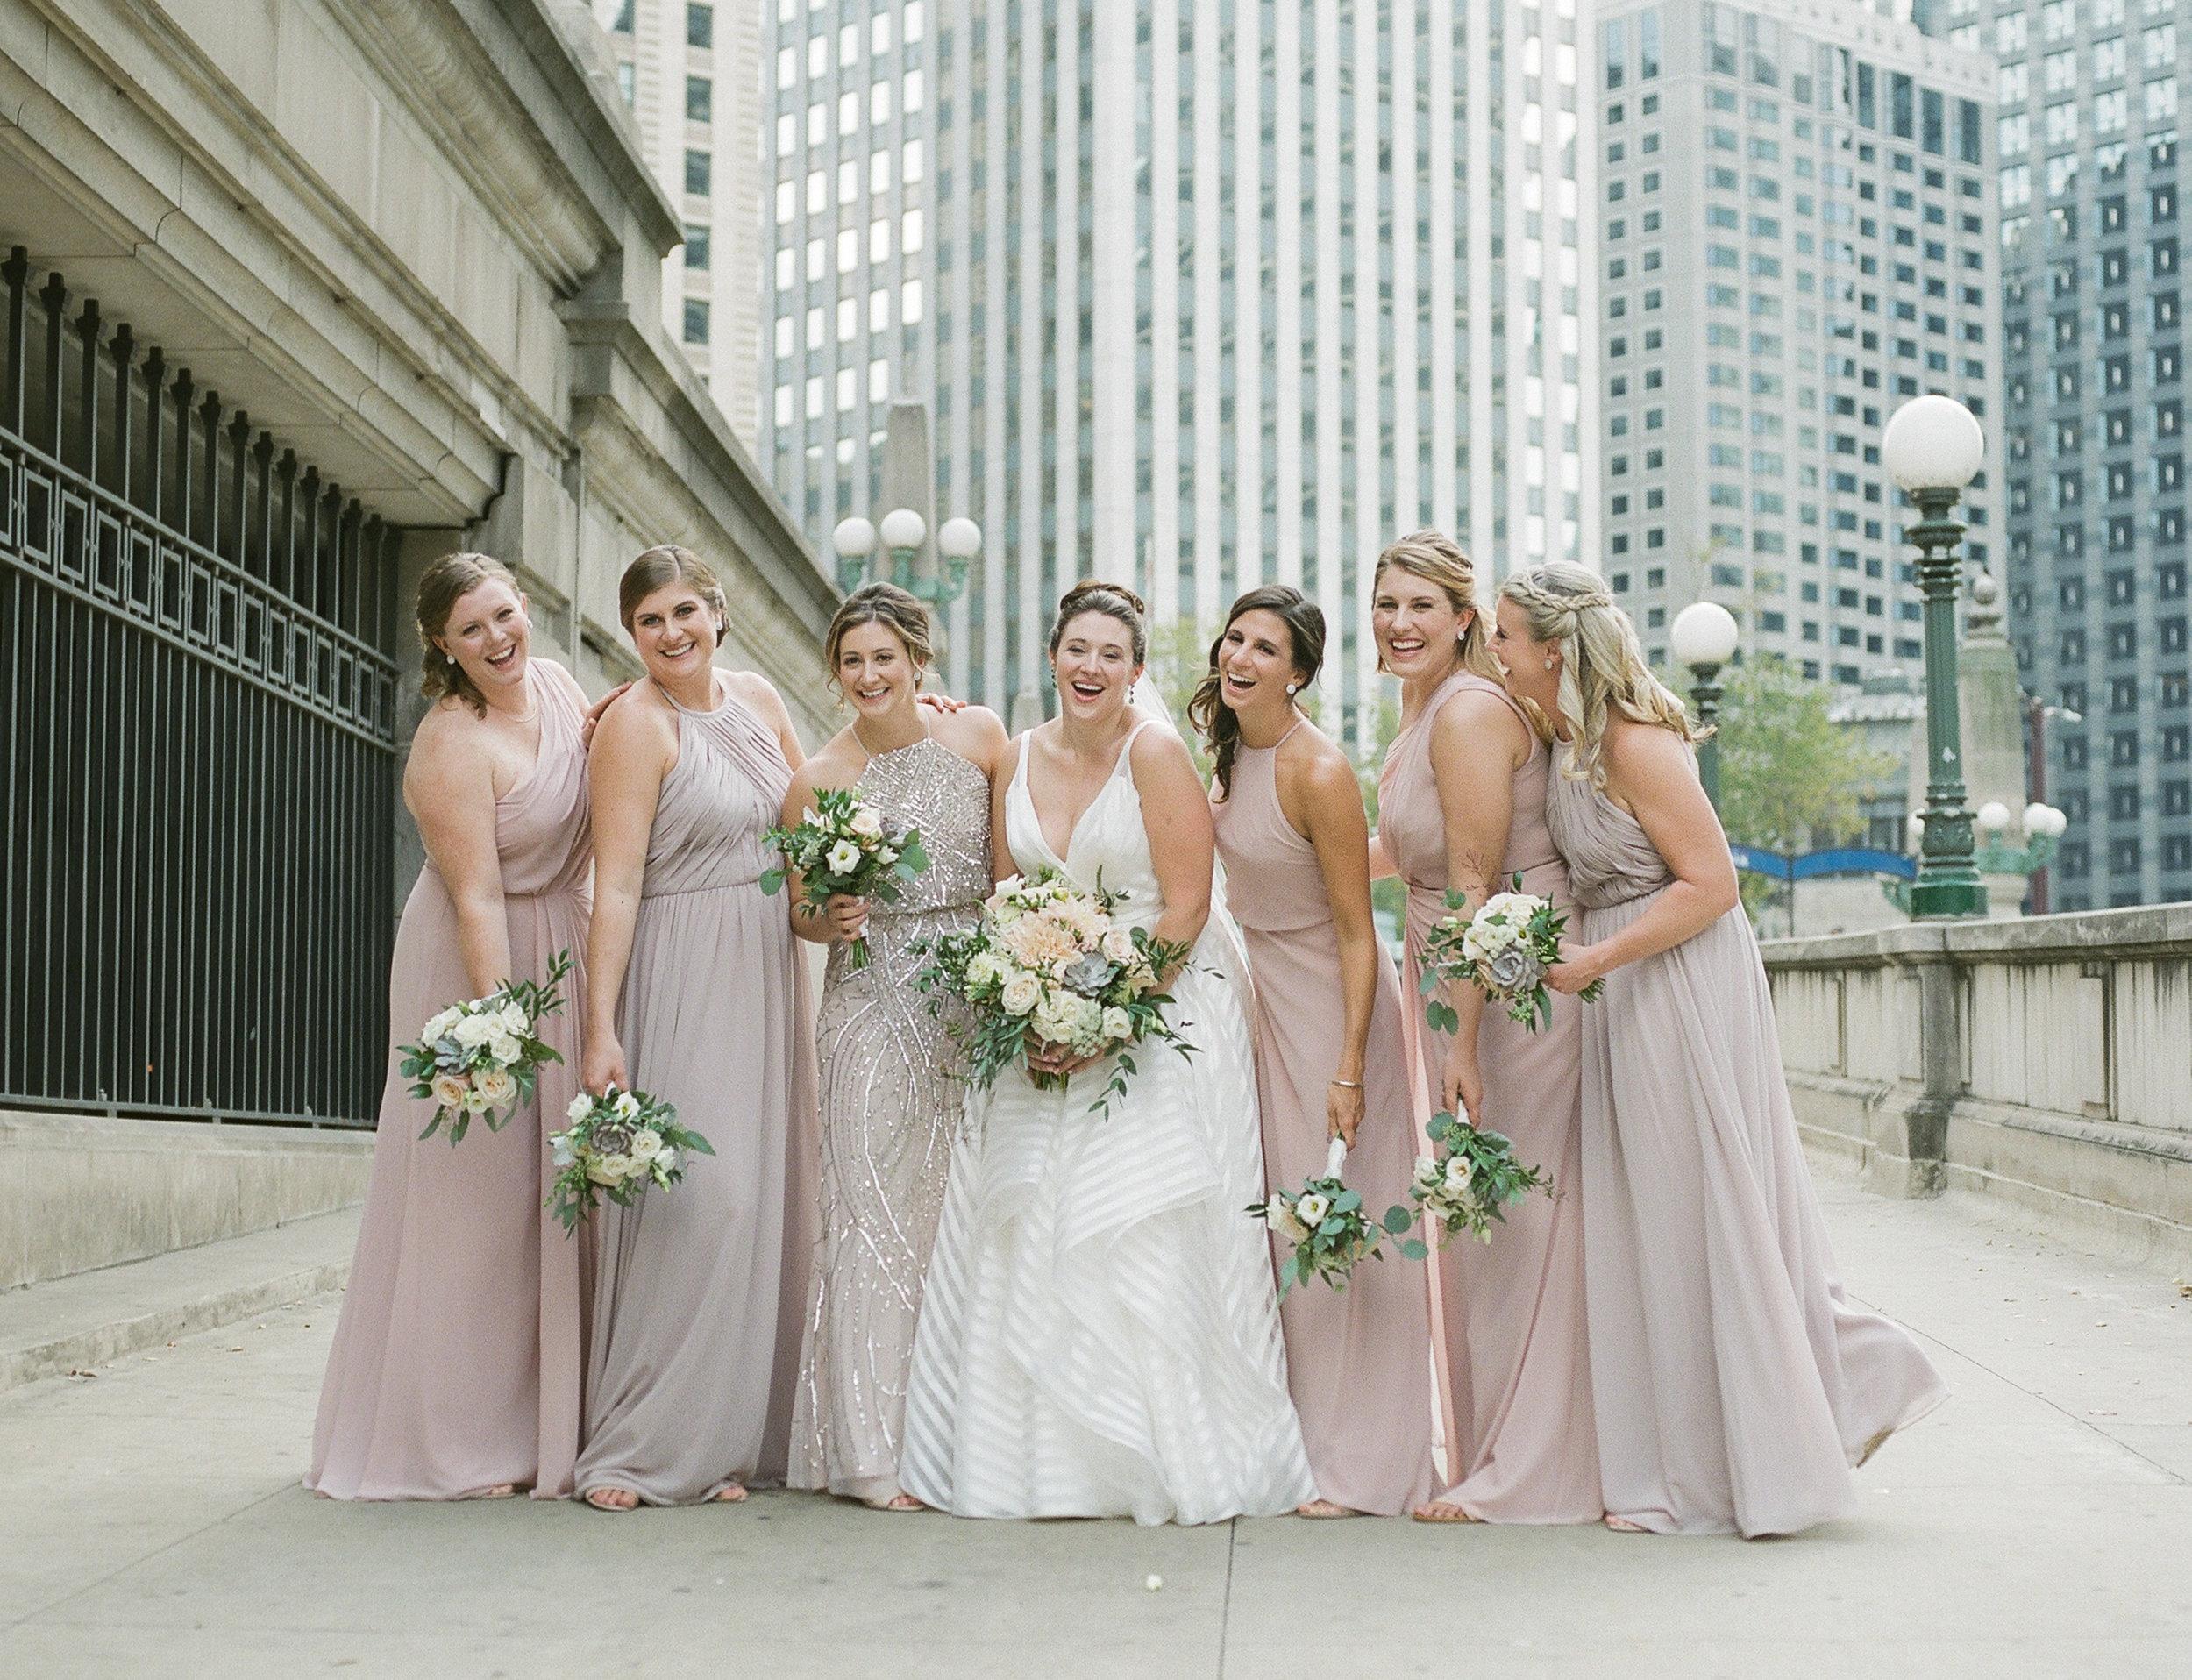 Bonphotage Chicago Fine Art Wedding Photography - London House Hotel